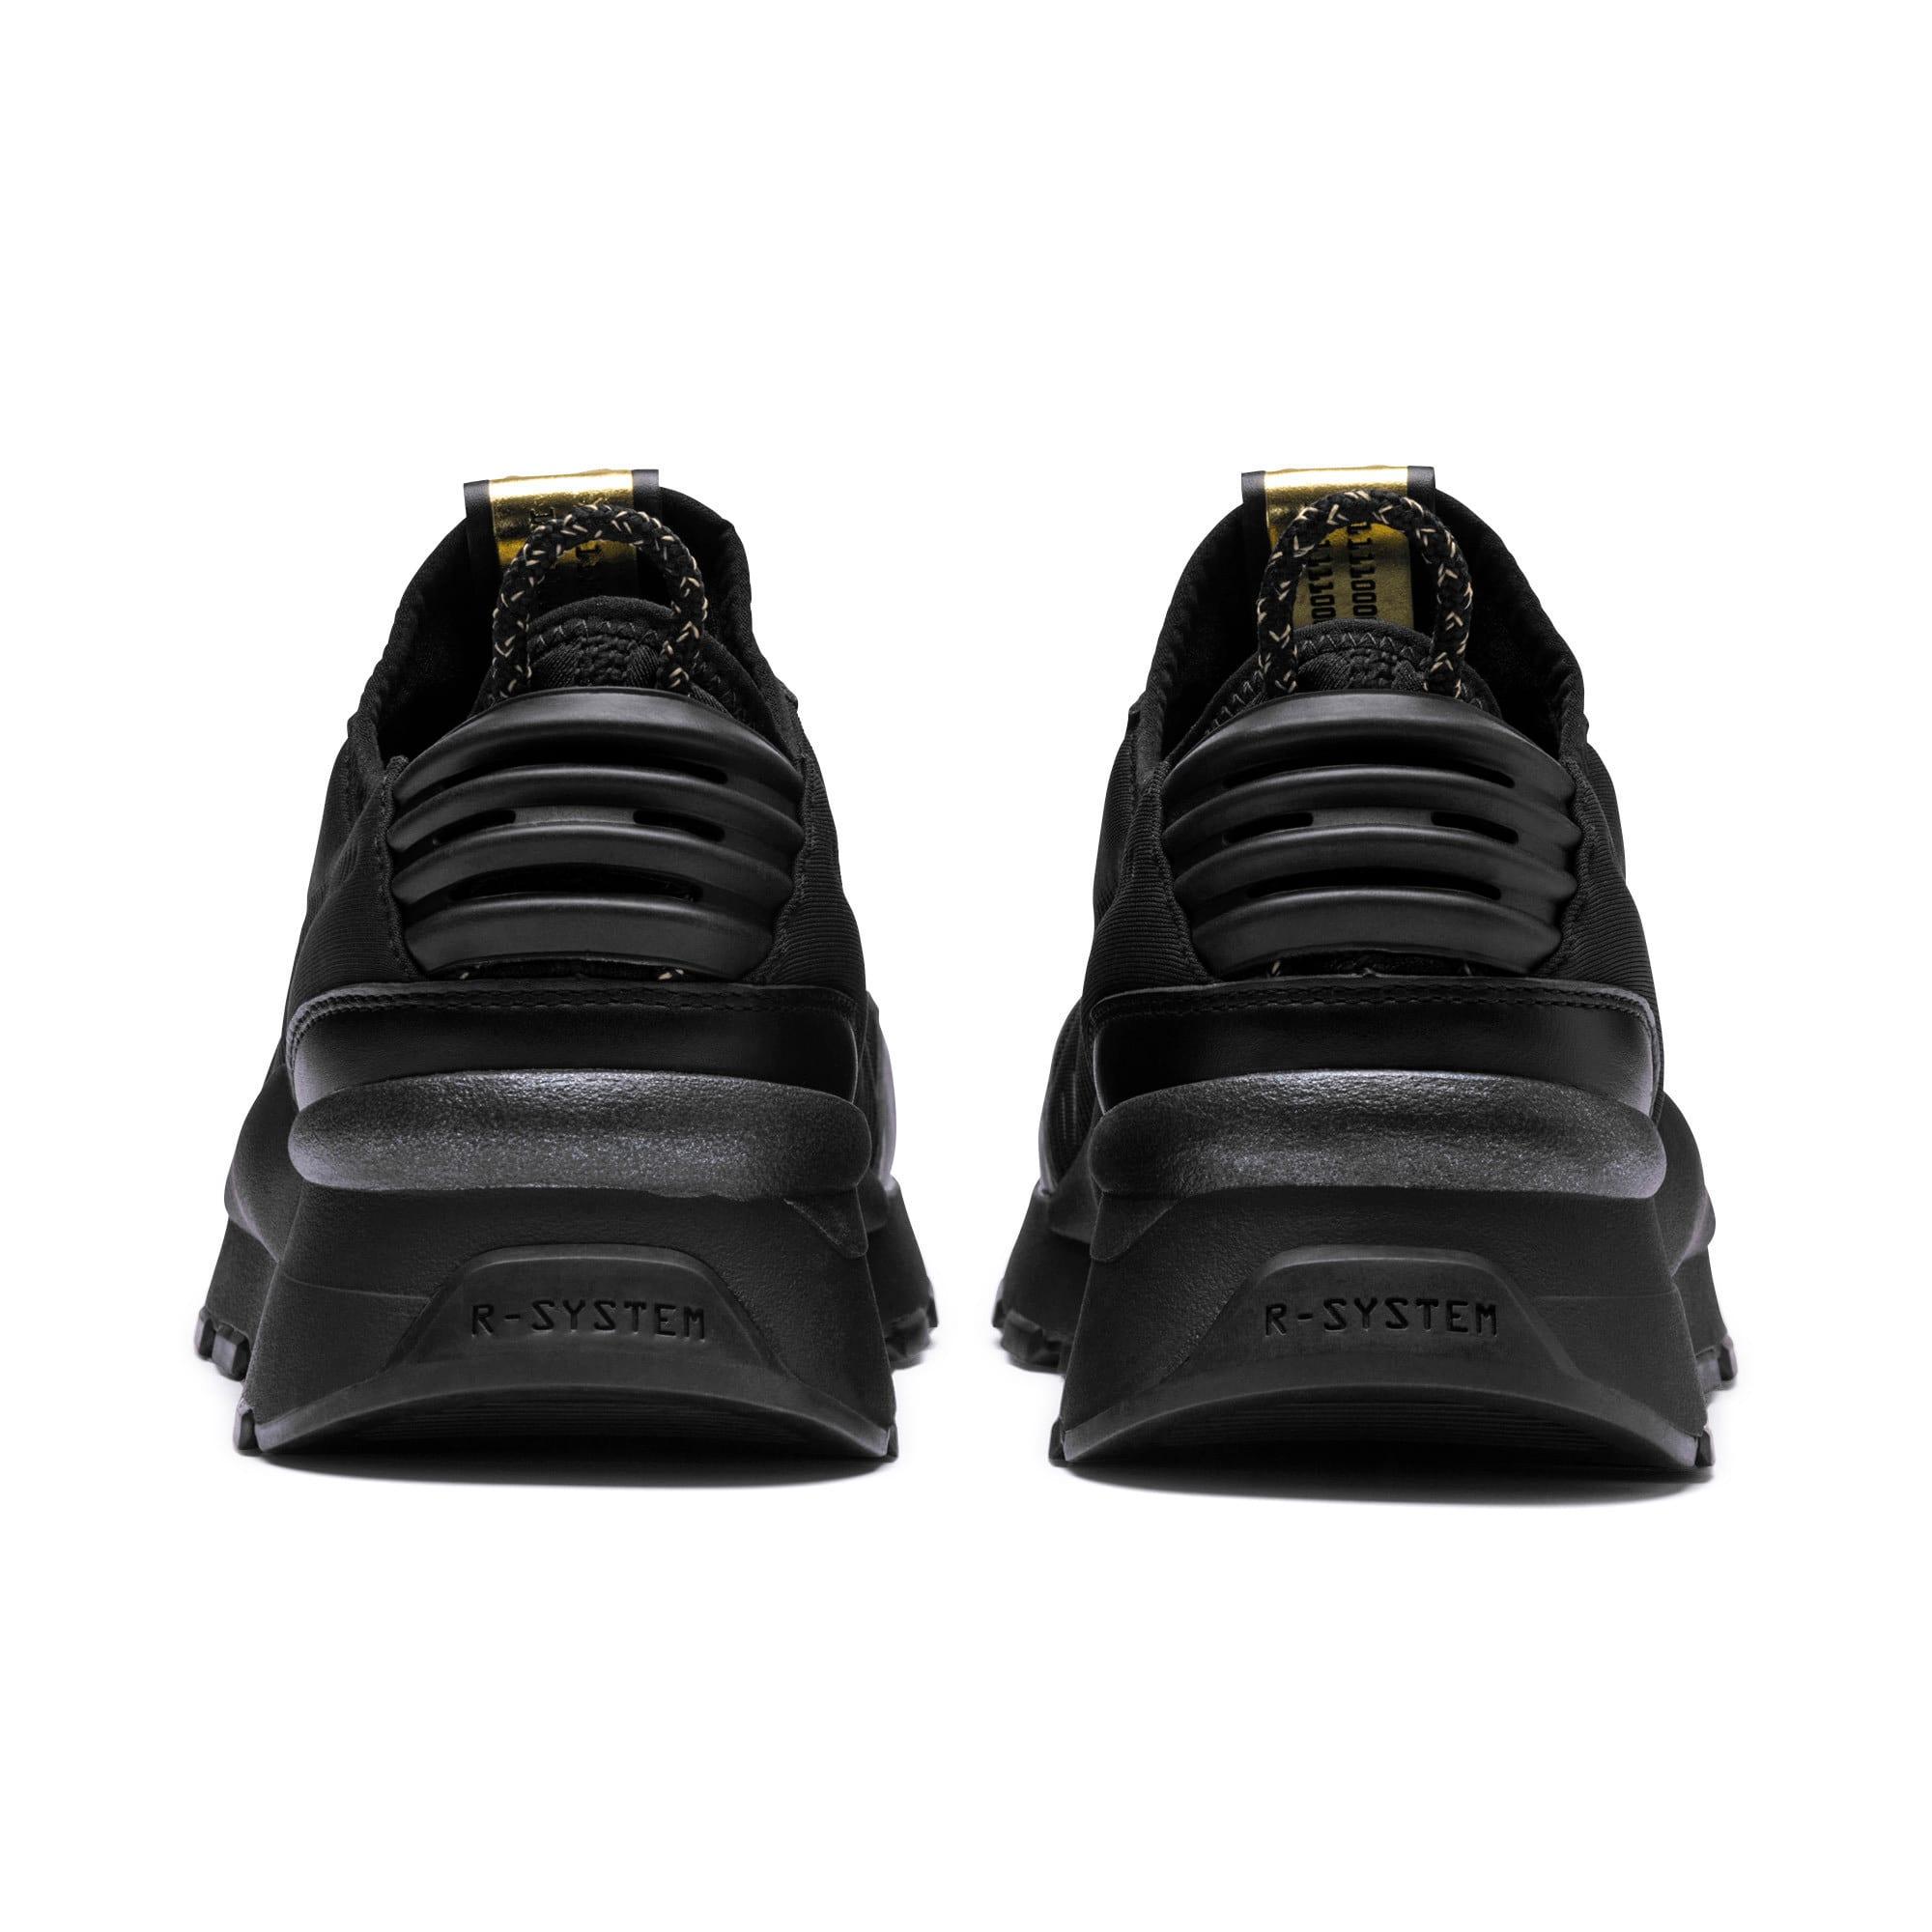 Thumbnail 4 of Basket RS-0 Trophy, Puma Black-Puma Black, medium